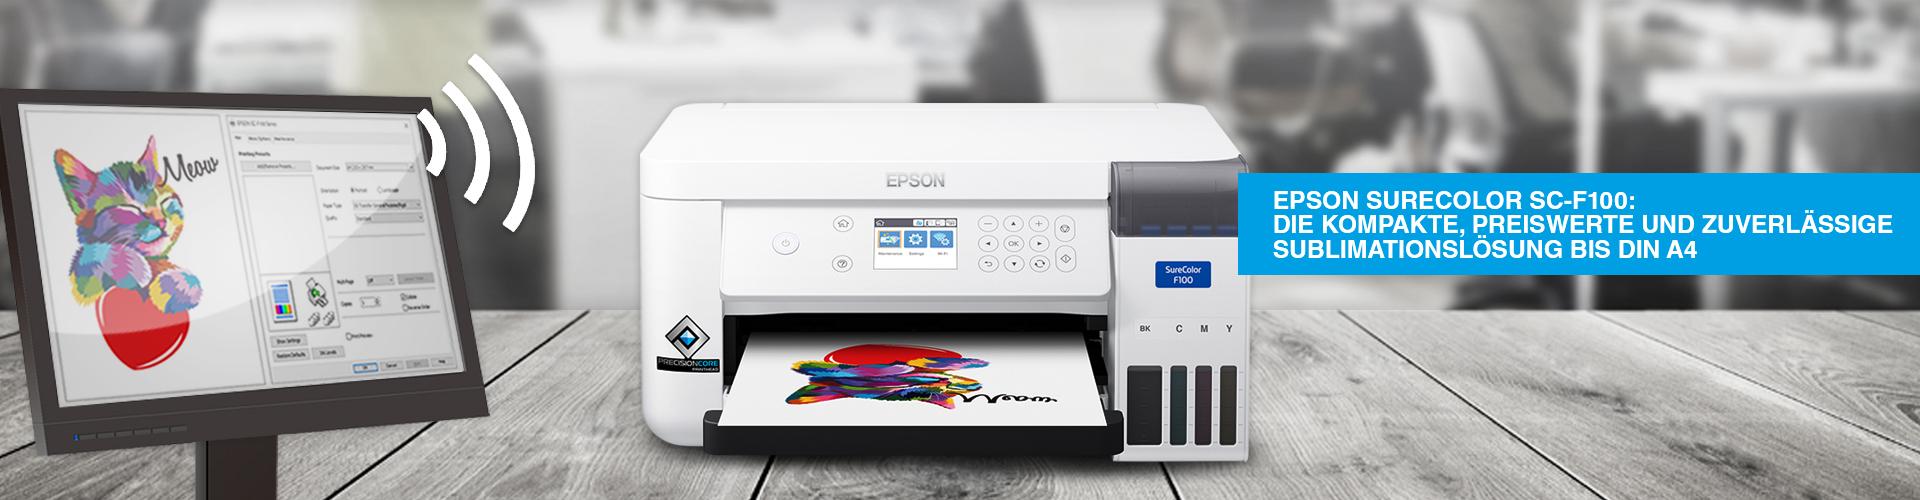 Epson Surecolor SC-F100, Epson Surecolor SC-F500 />